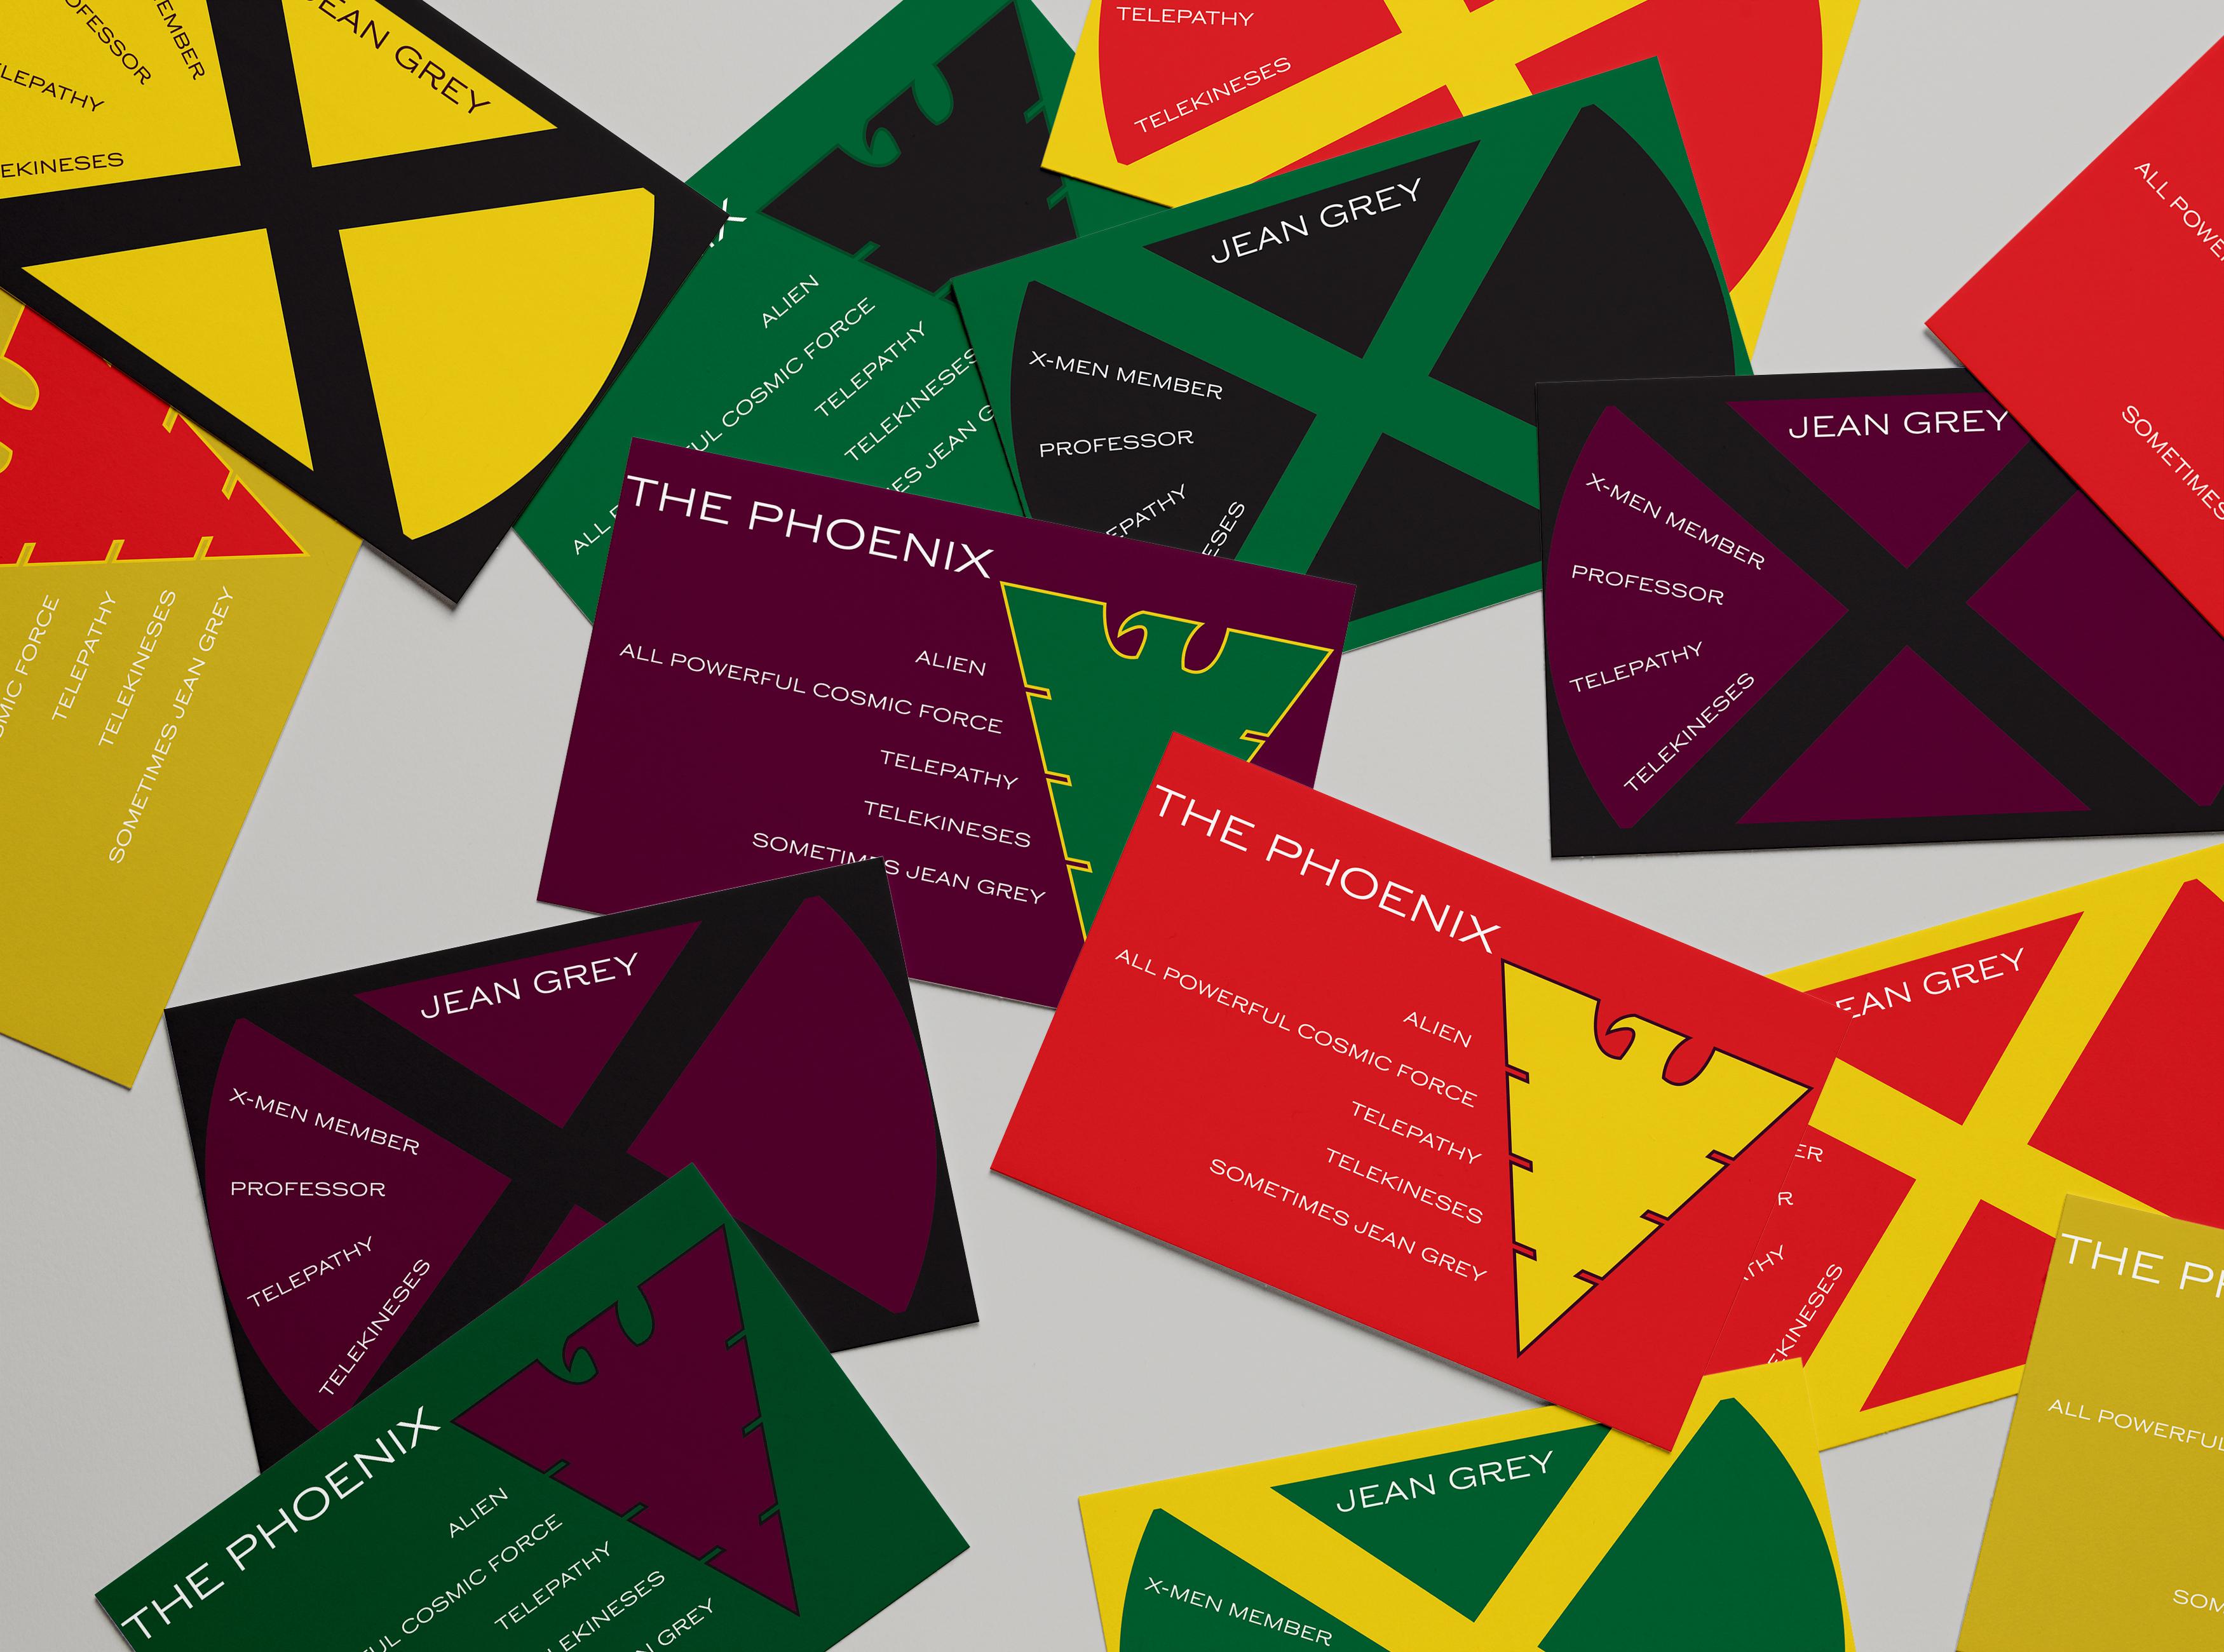 Jean Grey / Phoenix Business Card Mockup 1